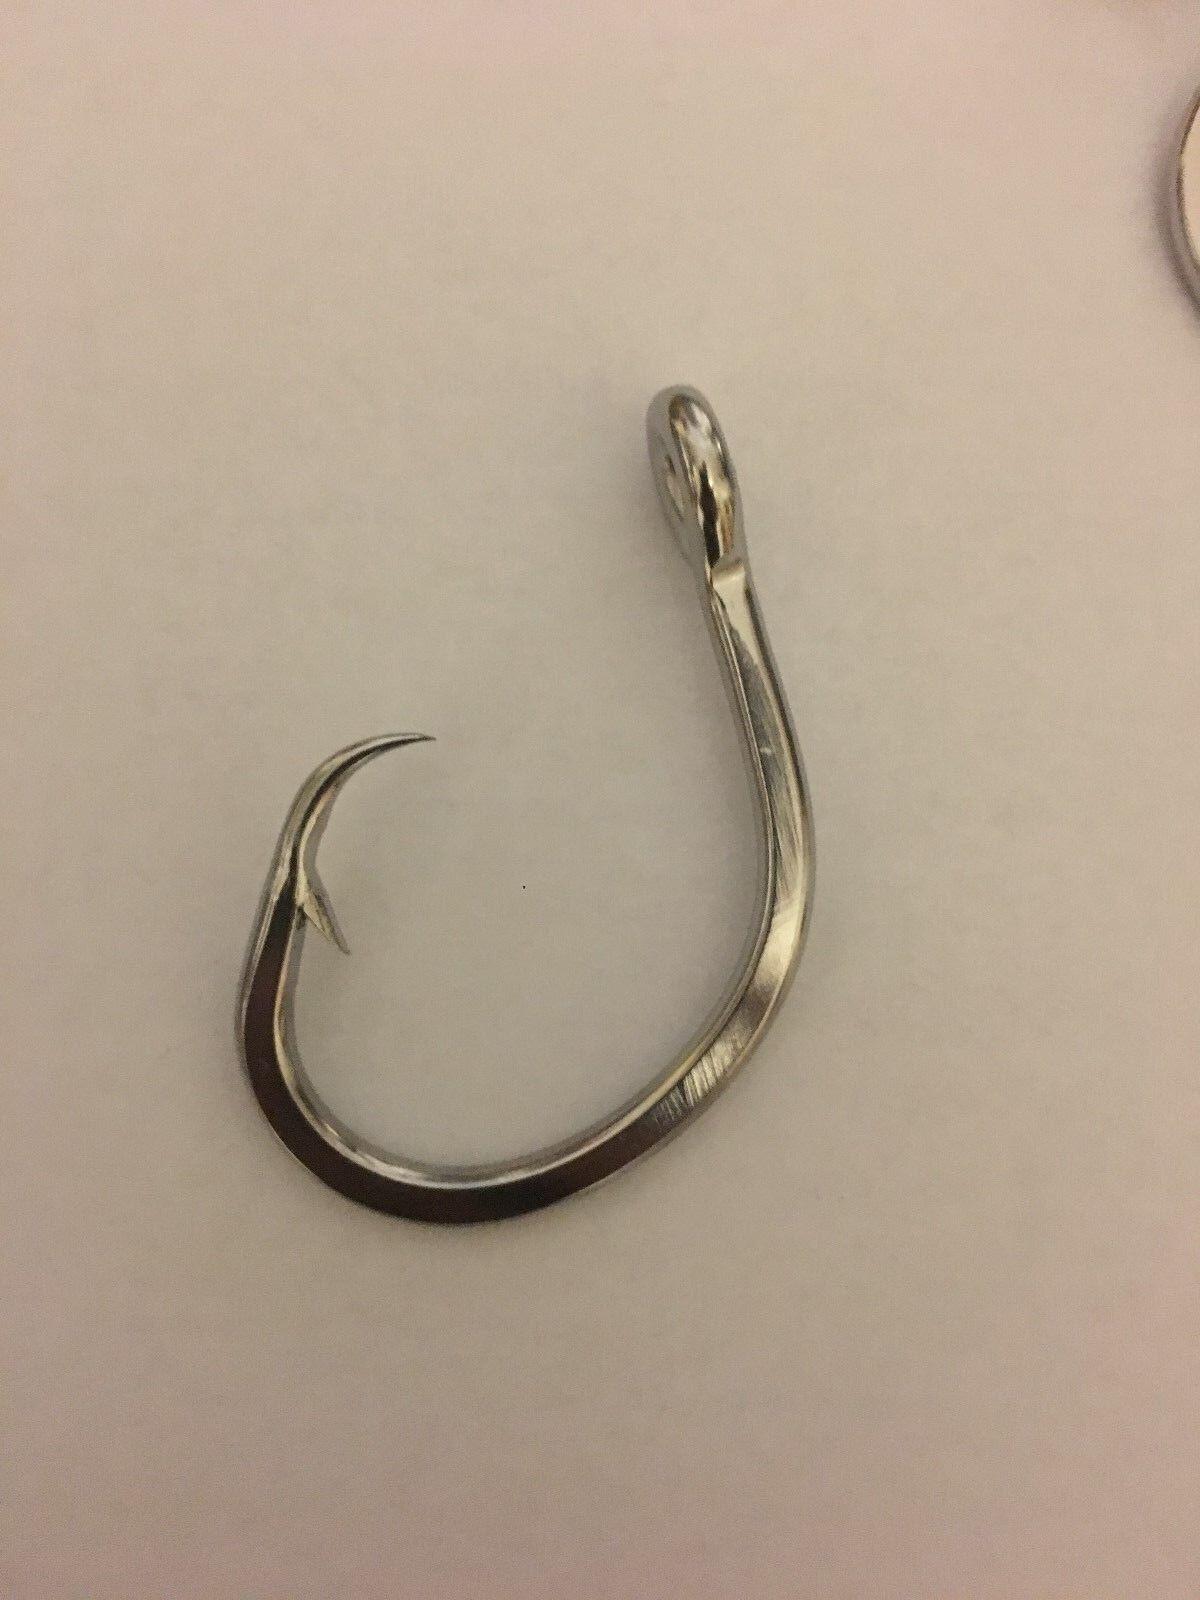 50 pcs  0  Stainless Steel Circle Tuna Fish Hook (50 Hooks)  in stadium promotions